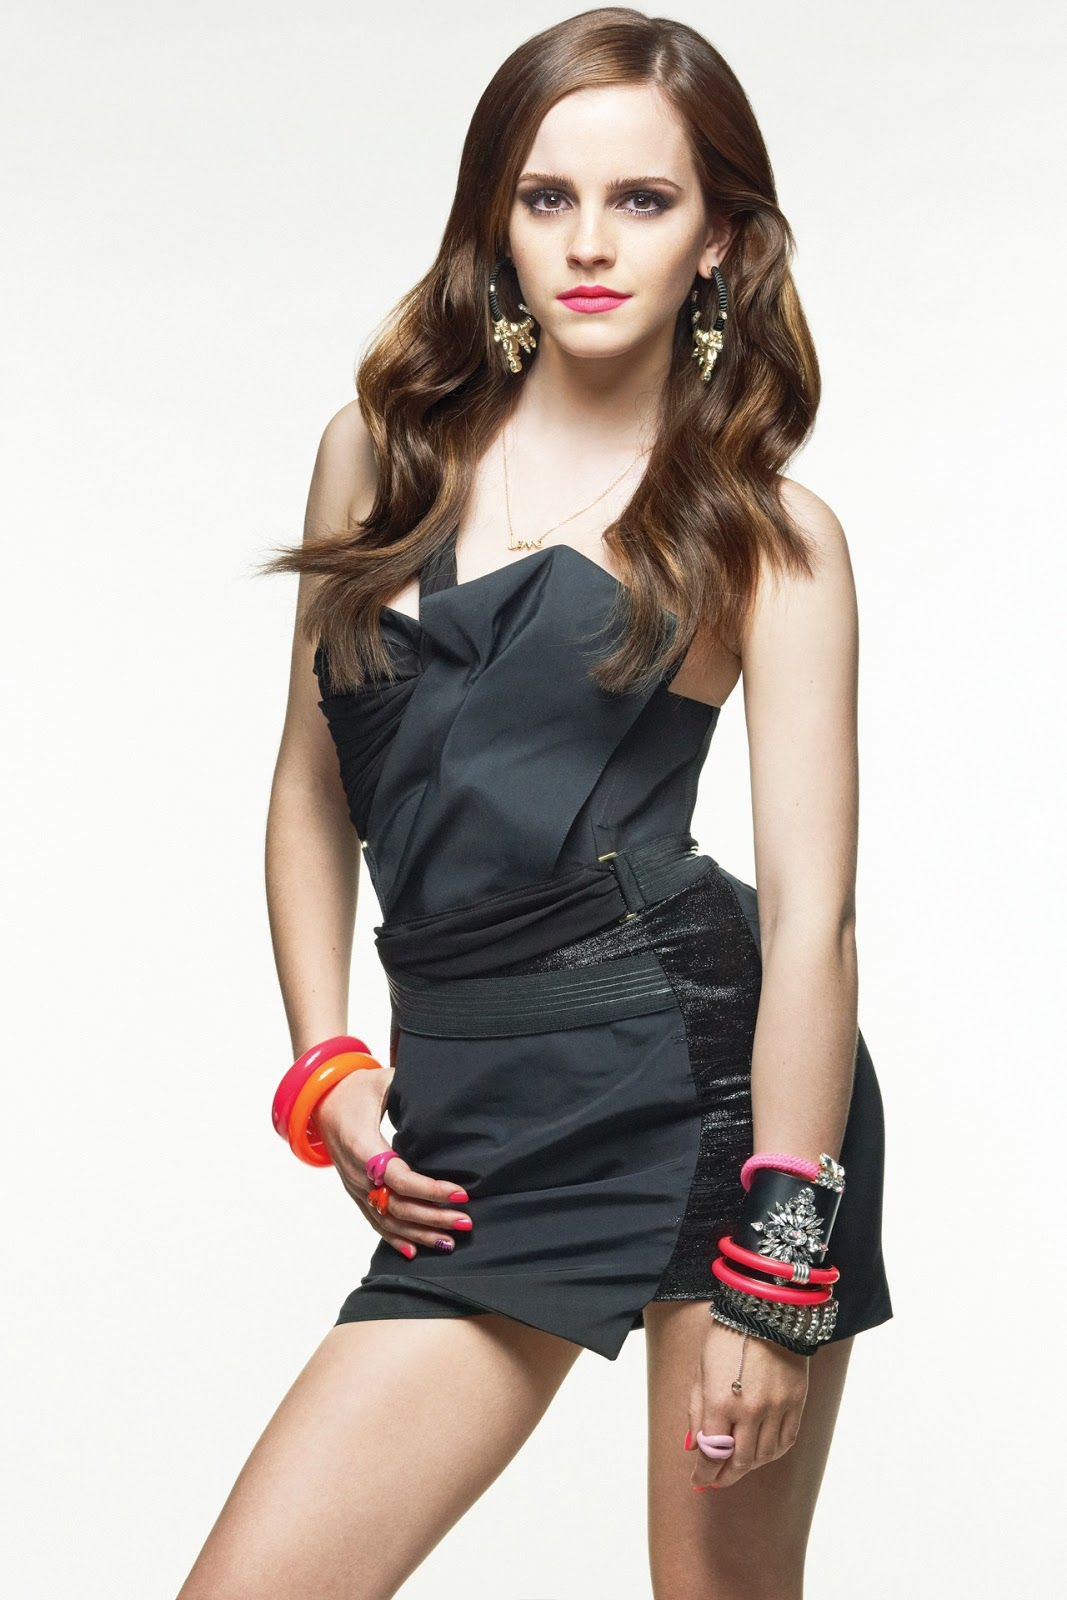 Emma Watson Hollywood Actress 40 Fantastic Photos: World Celebrities HD Wallpapers